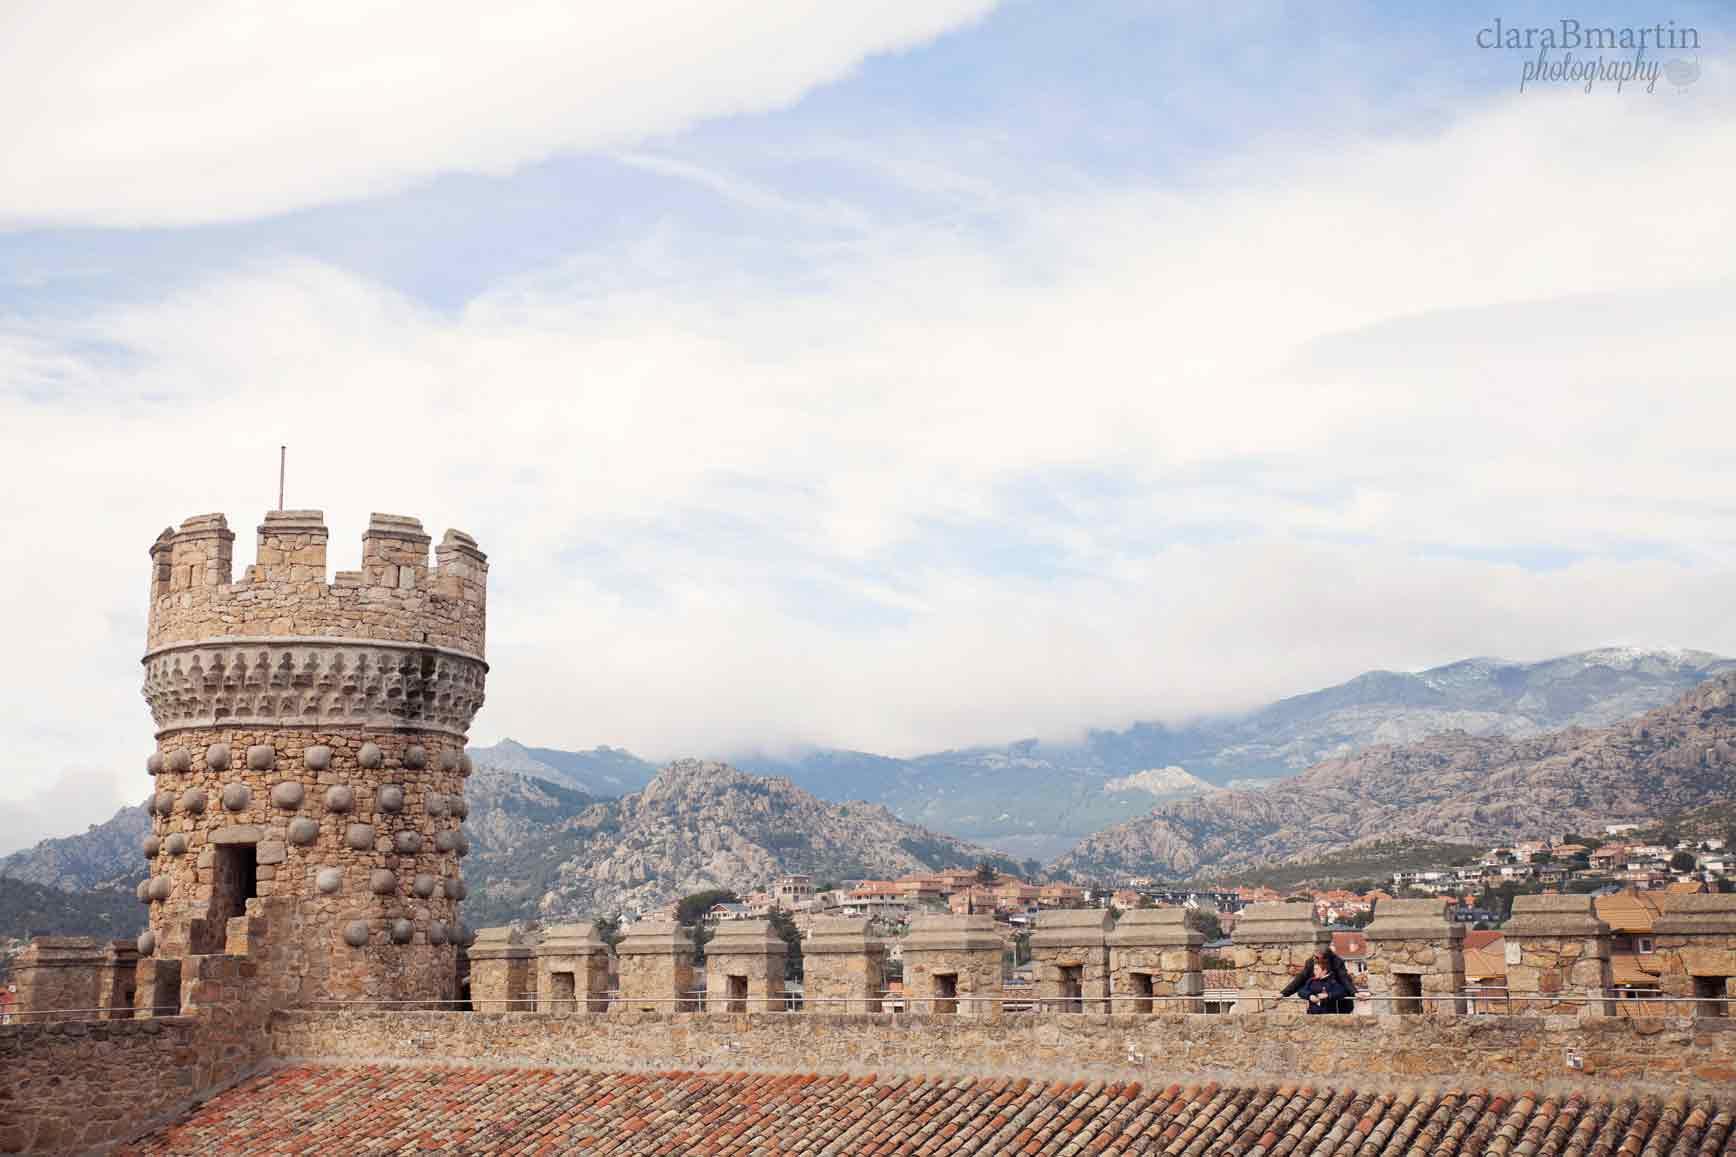 Castillo-Manzanares-El-Real-claraBmartin-10